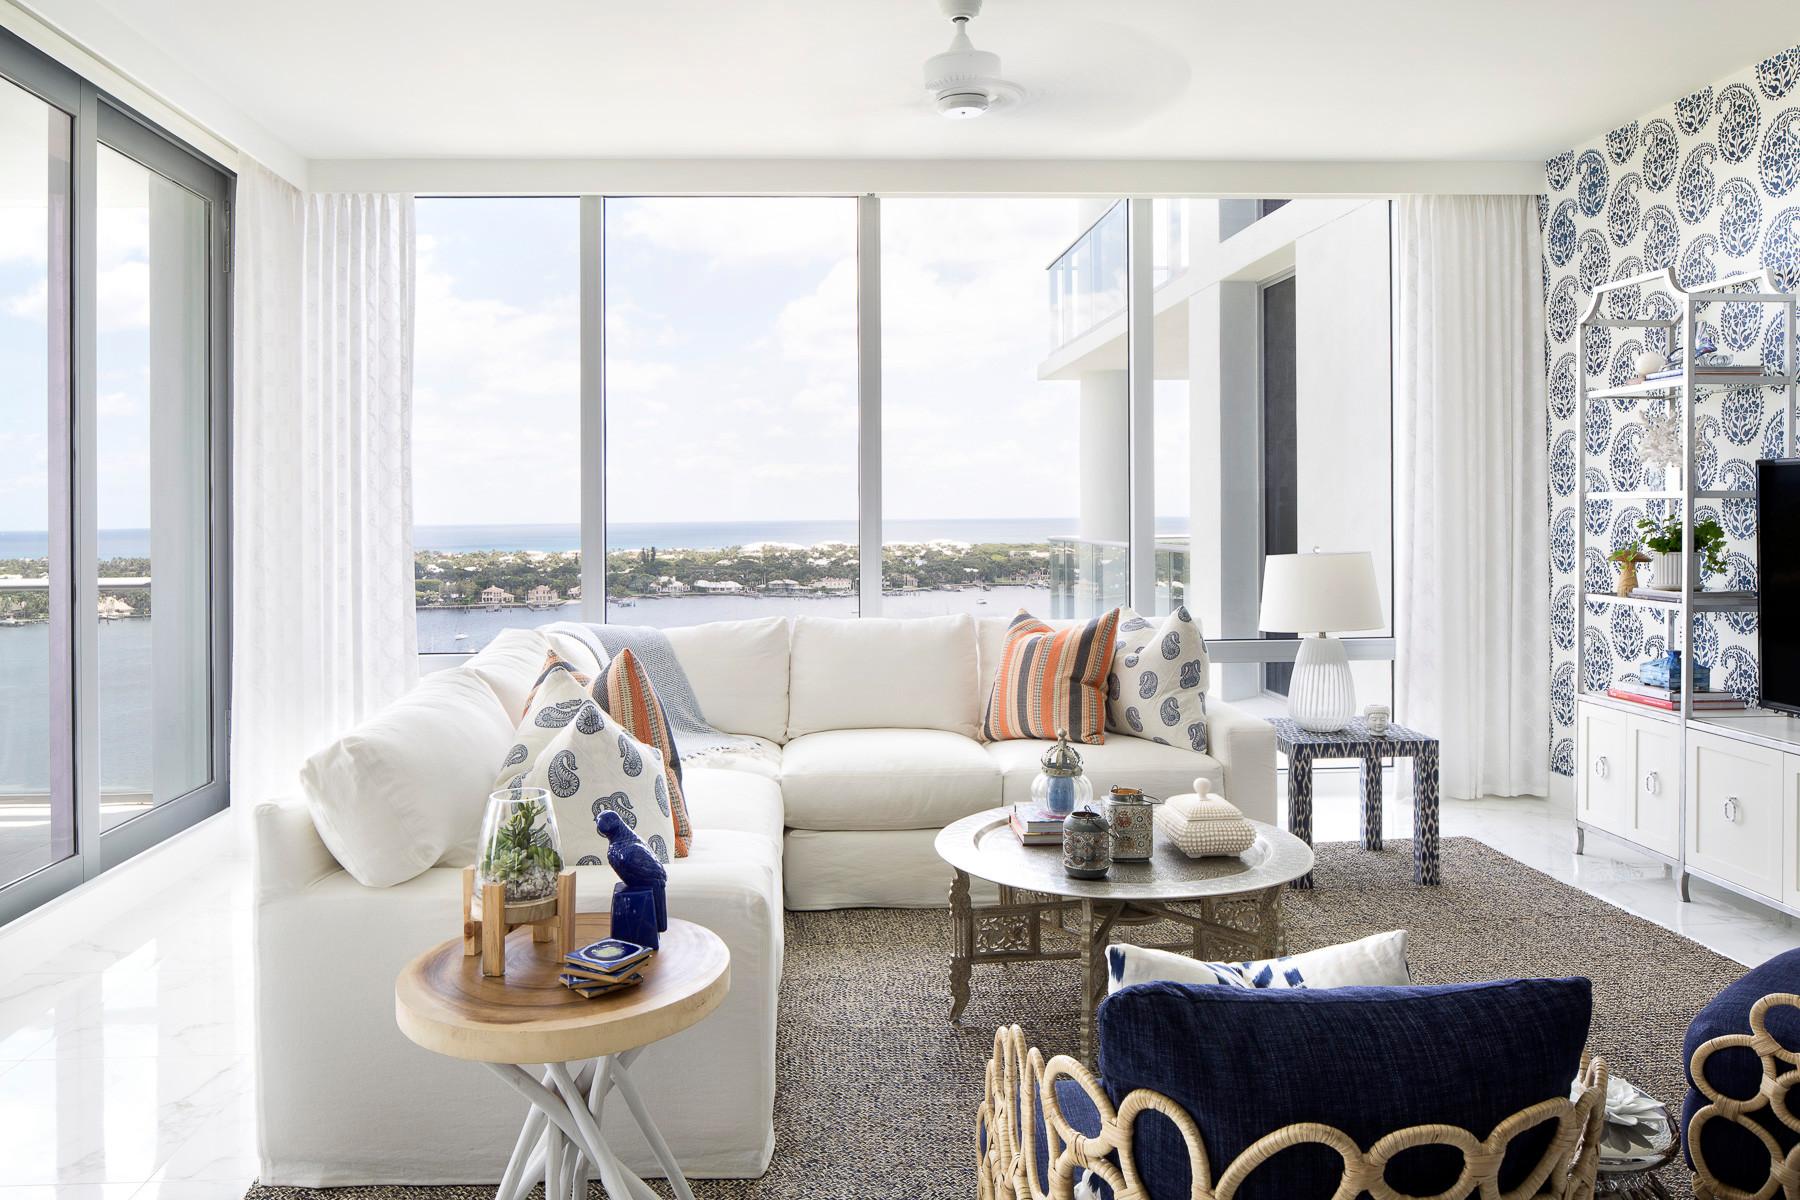 Living room - coastal living room idea in Miami